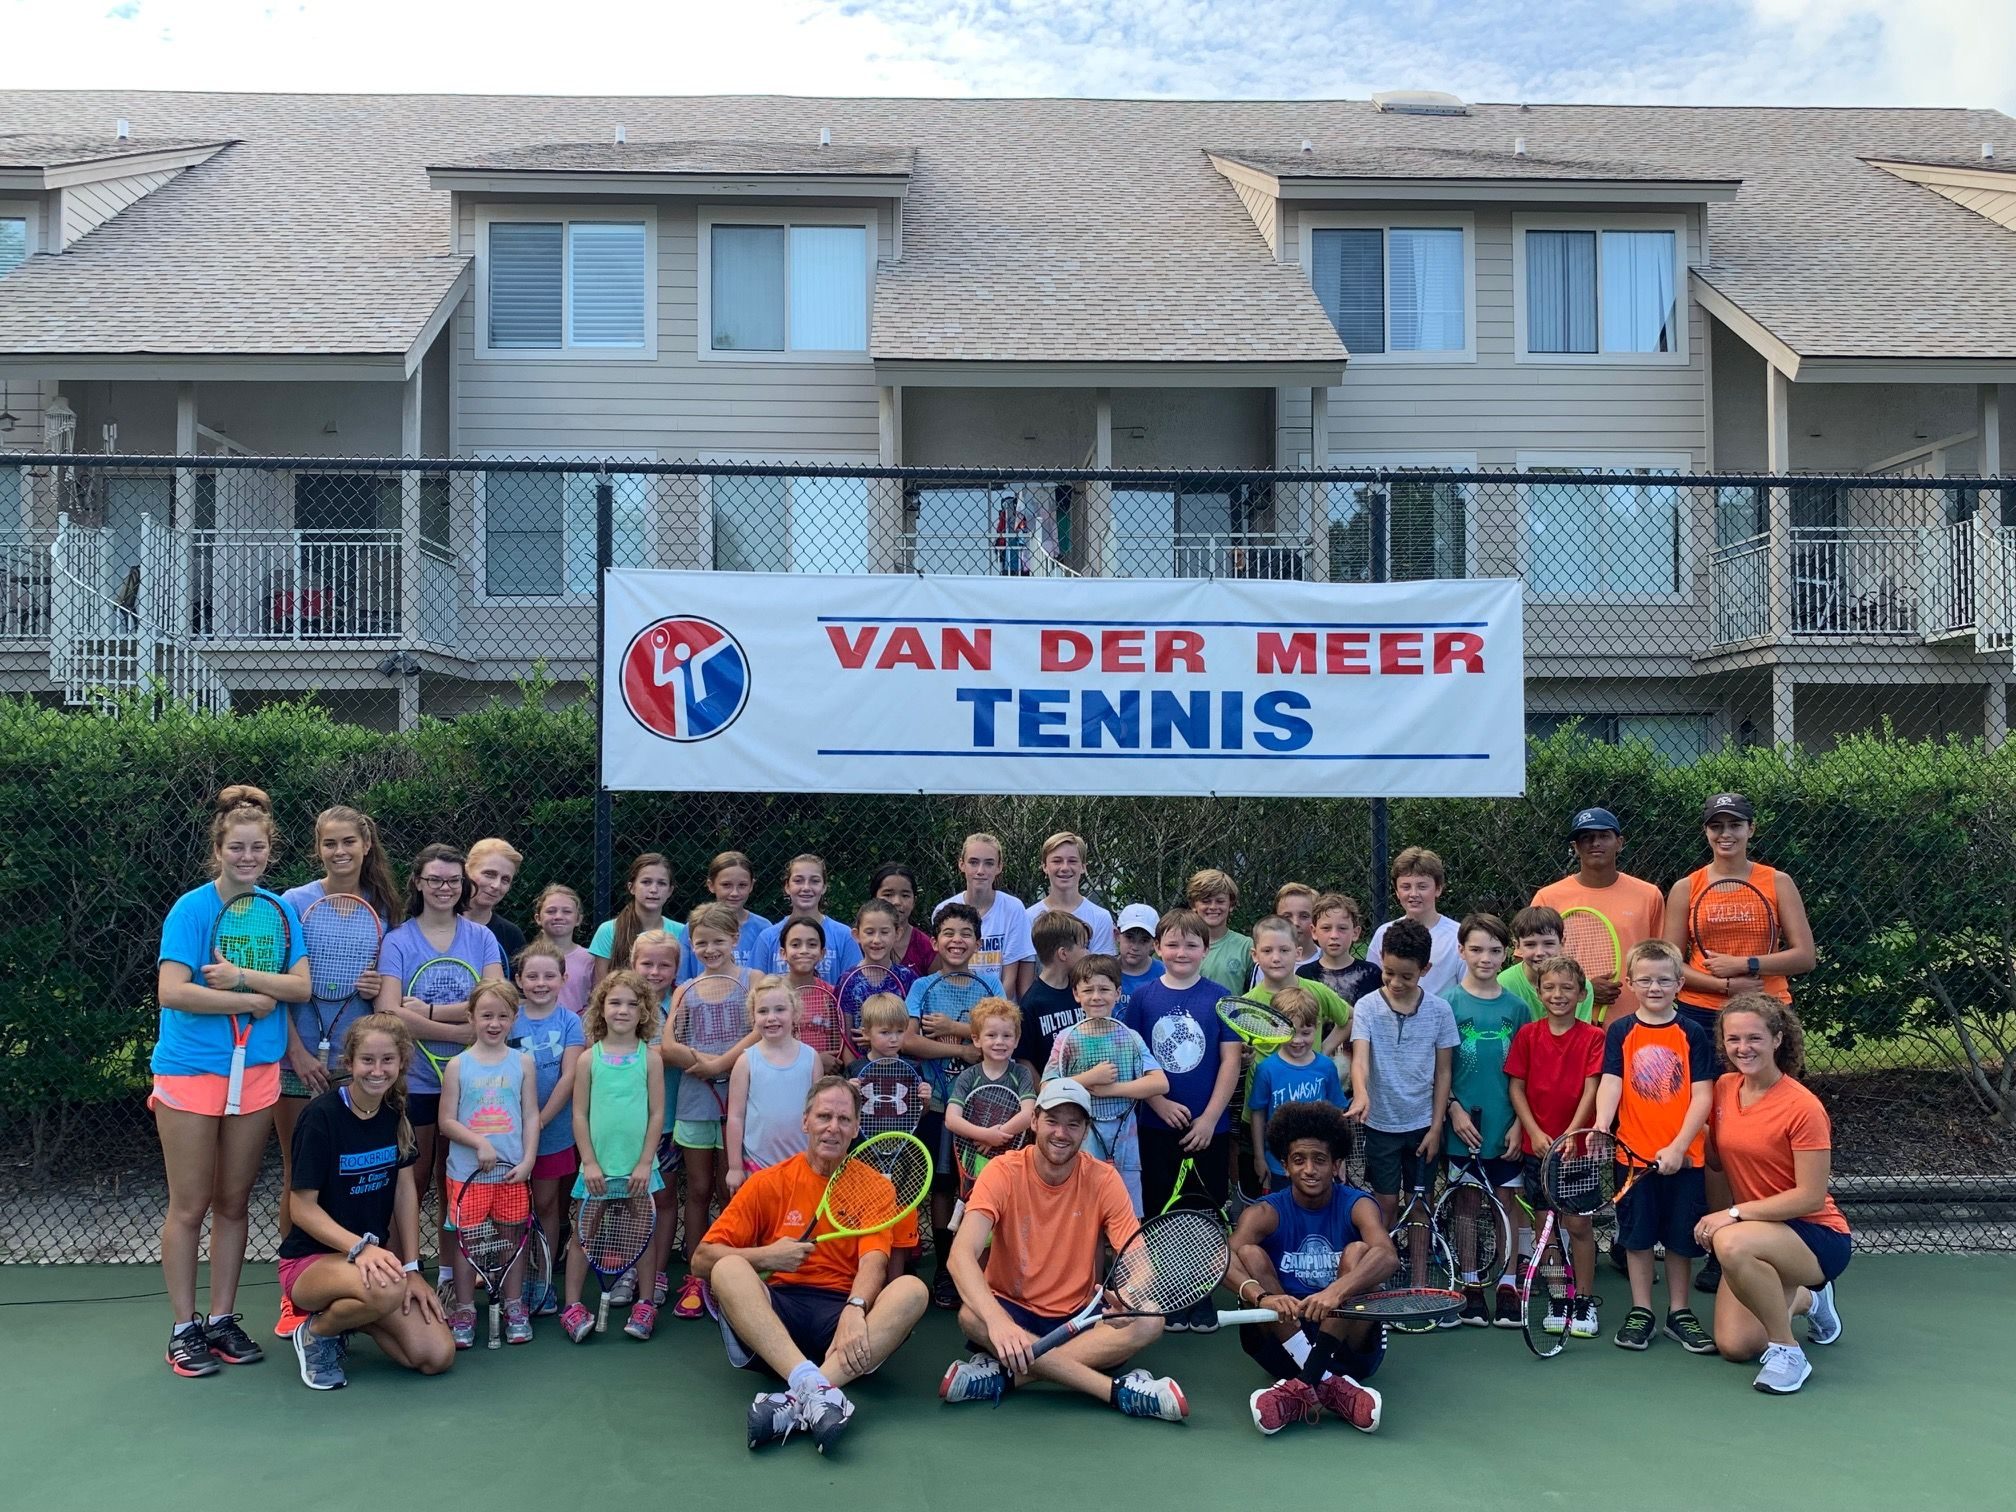 Van Der Meer Tennis Hilton Head Island Sc Nationaly Recognized Junior Tennis Program Offered At 2 Levels Juniors In 2020 Tennis Camp Hilton Head Island Summer Camp